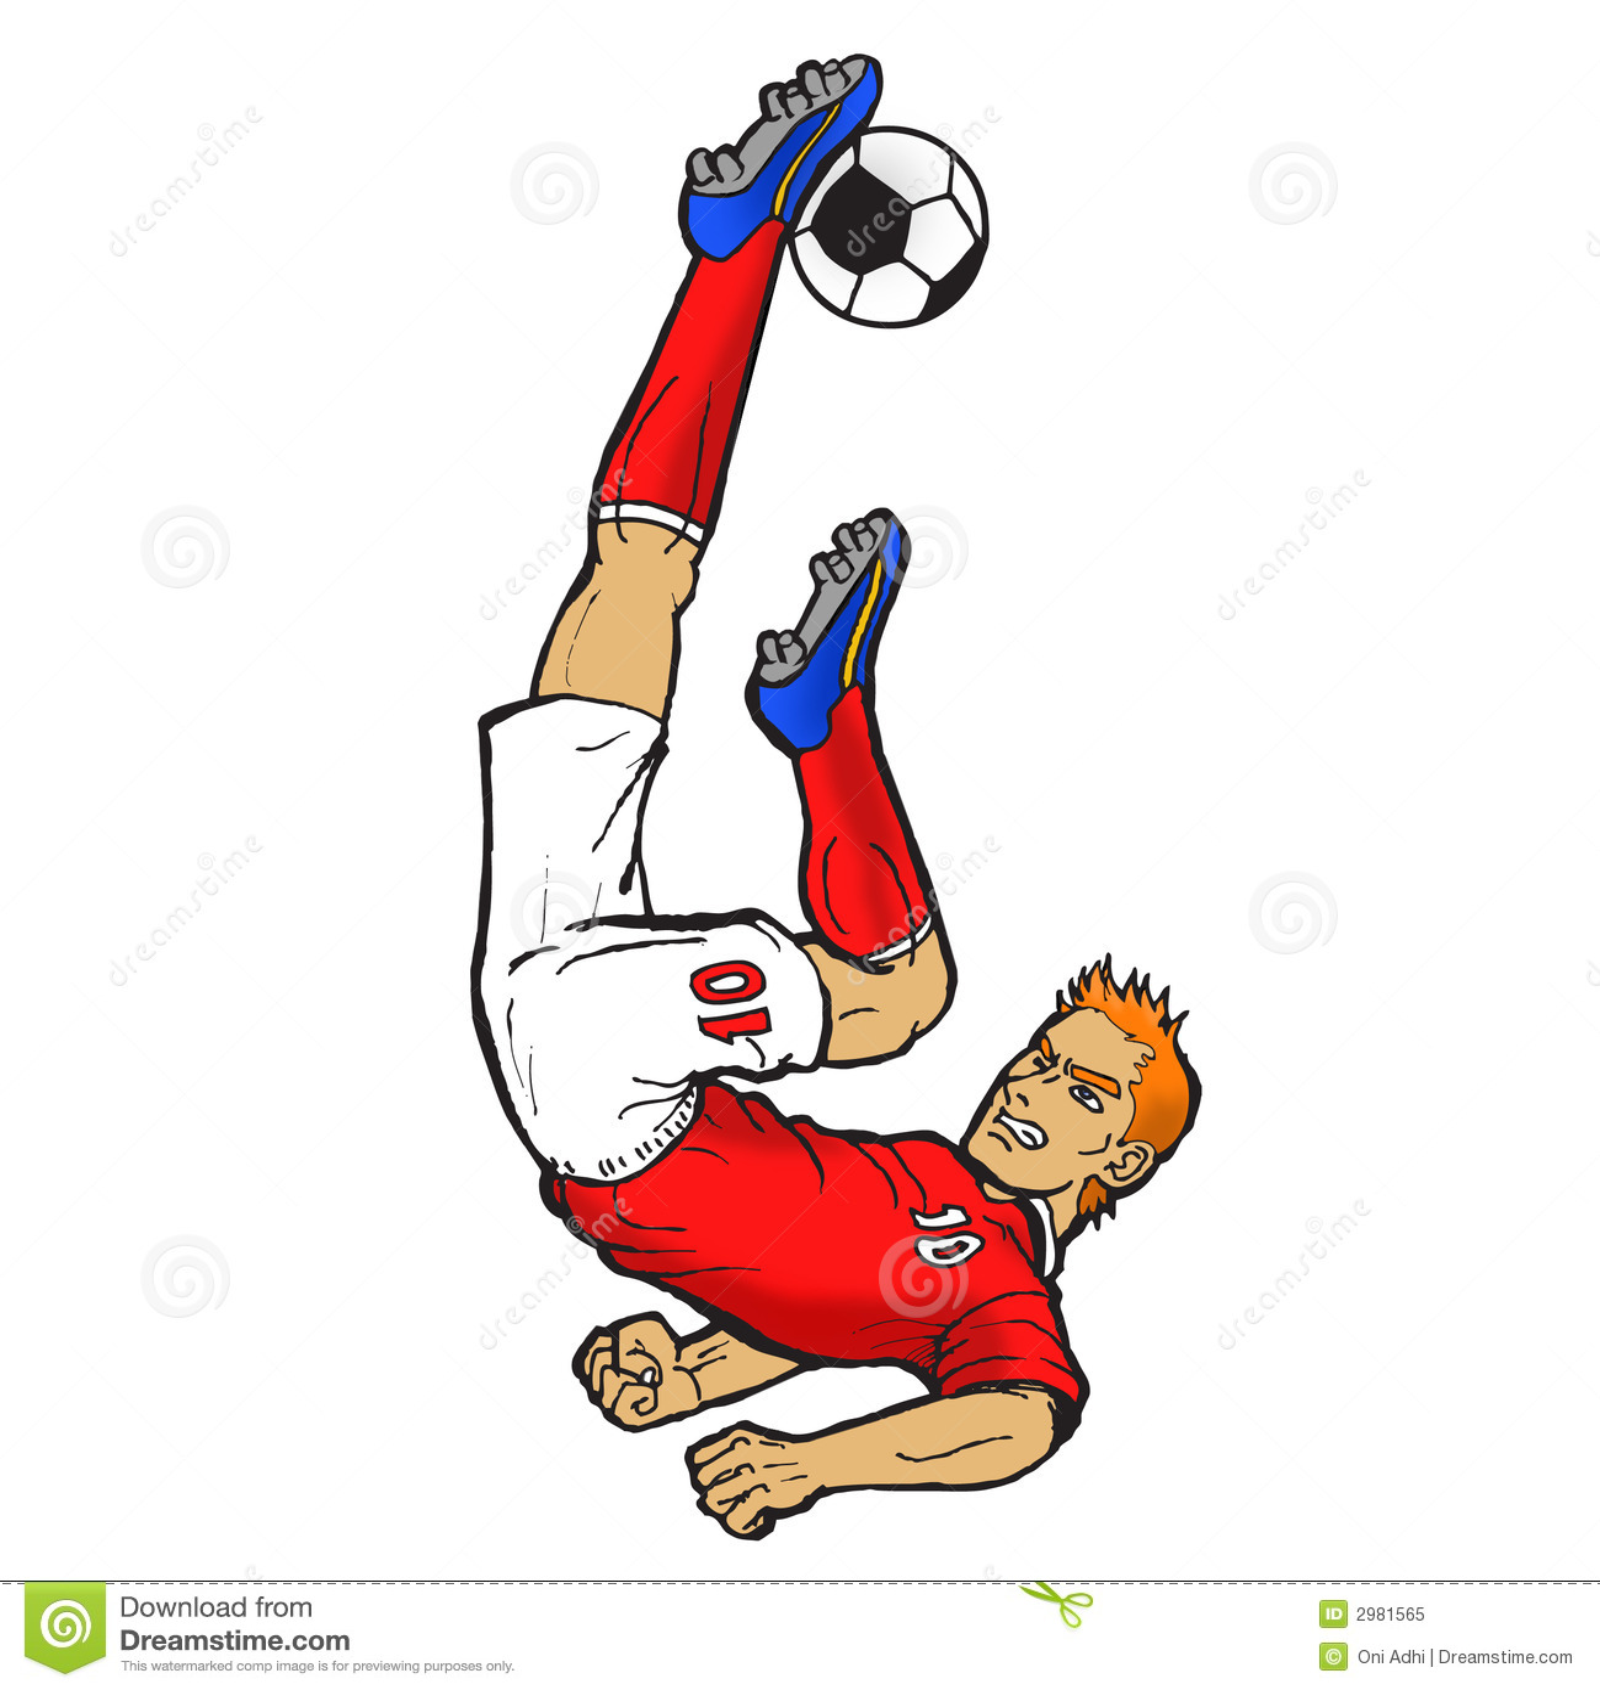 Footballer Doing Bicycle Kick Royalty Free Stock Photo ...